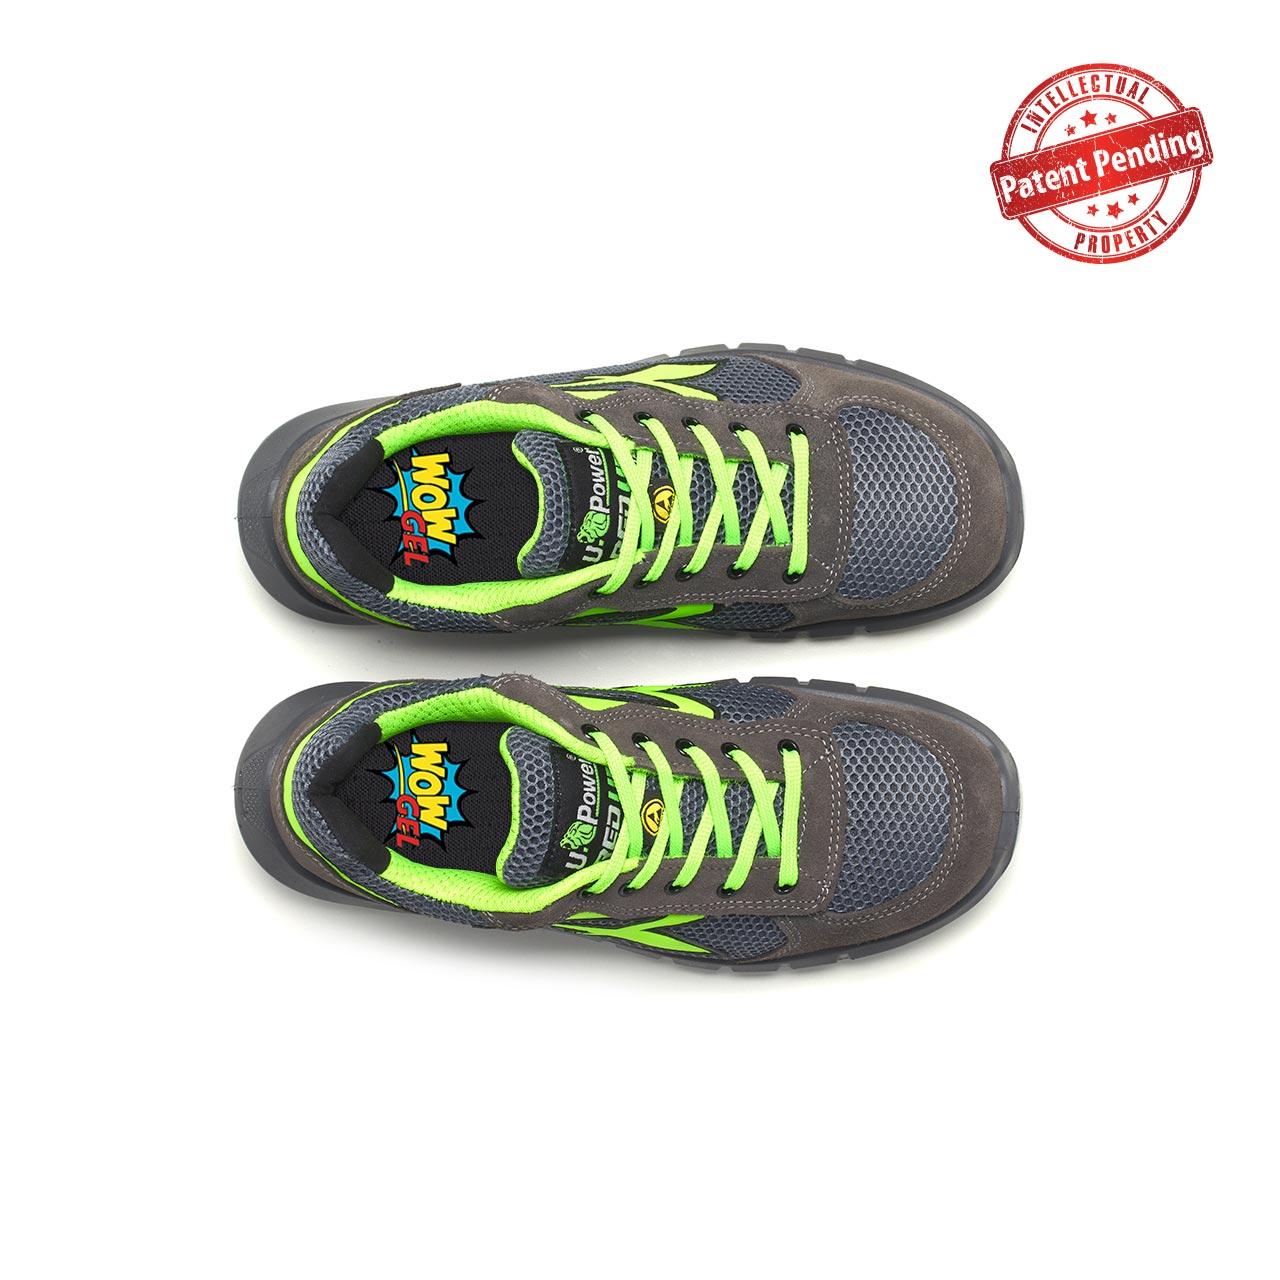 paio di scarpe antinfortunistiche upower modello gemini plus linea redup plus vista top